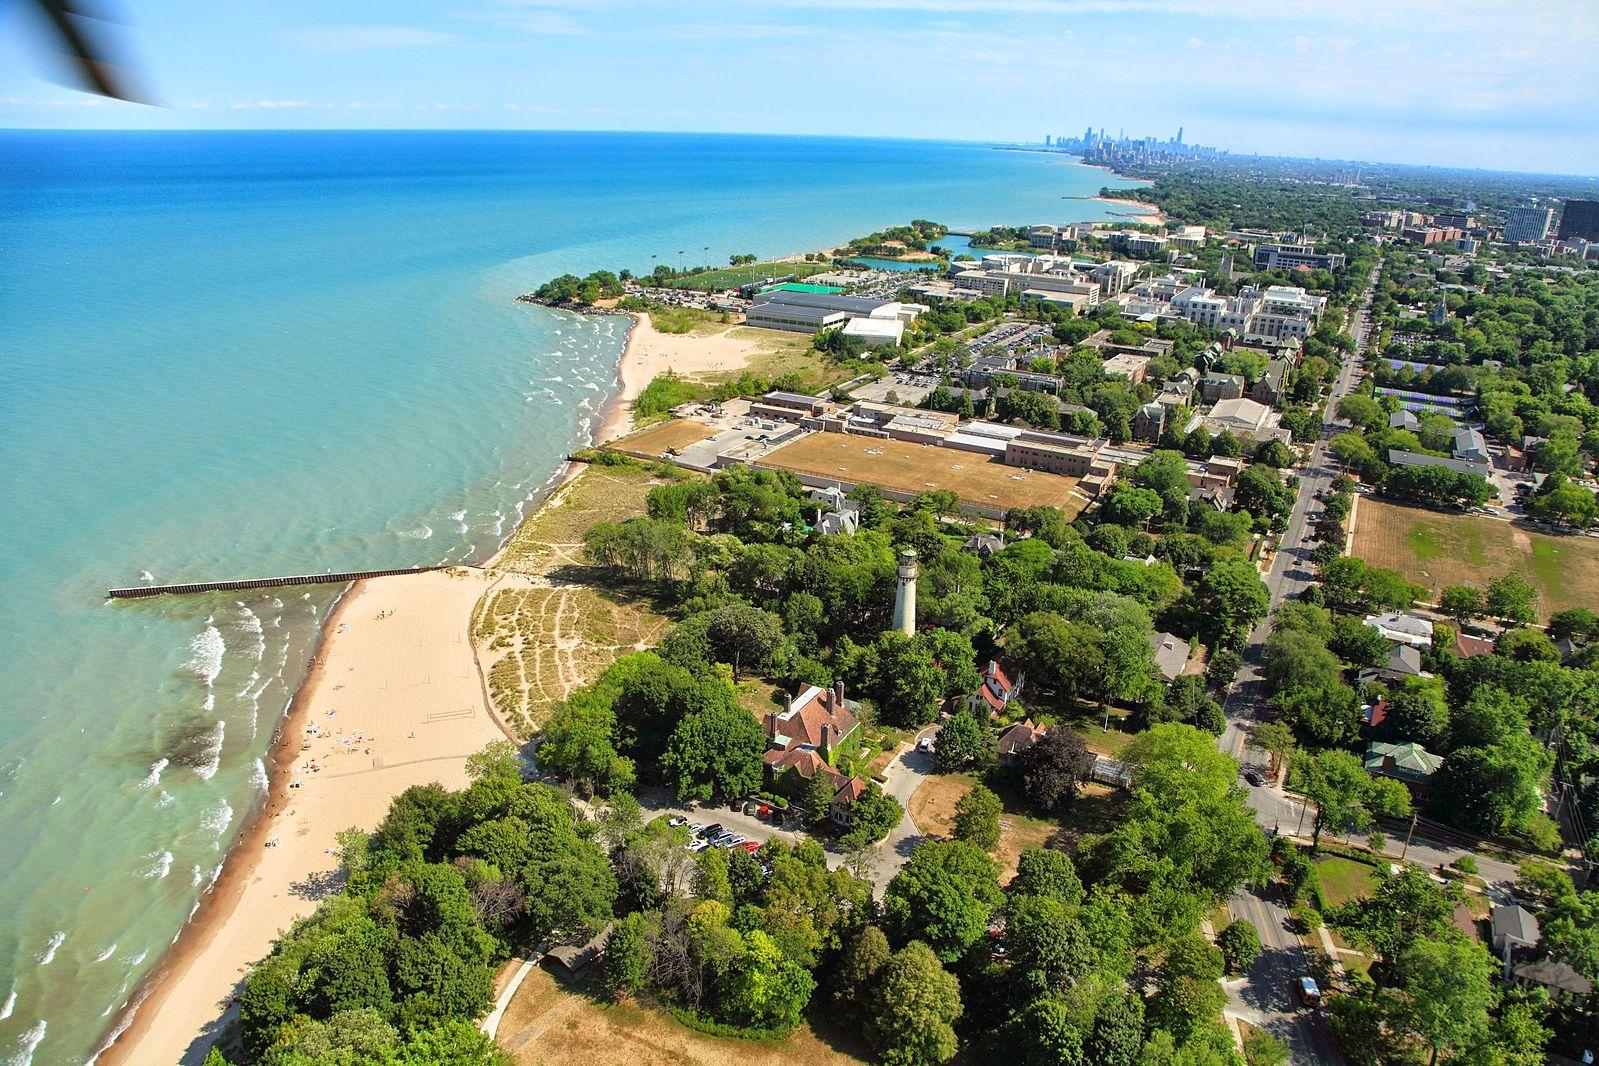 Evanston lakefront